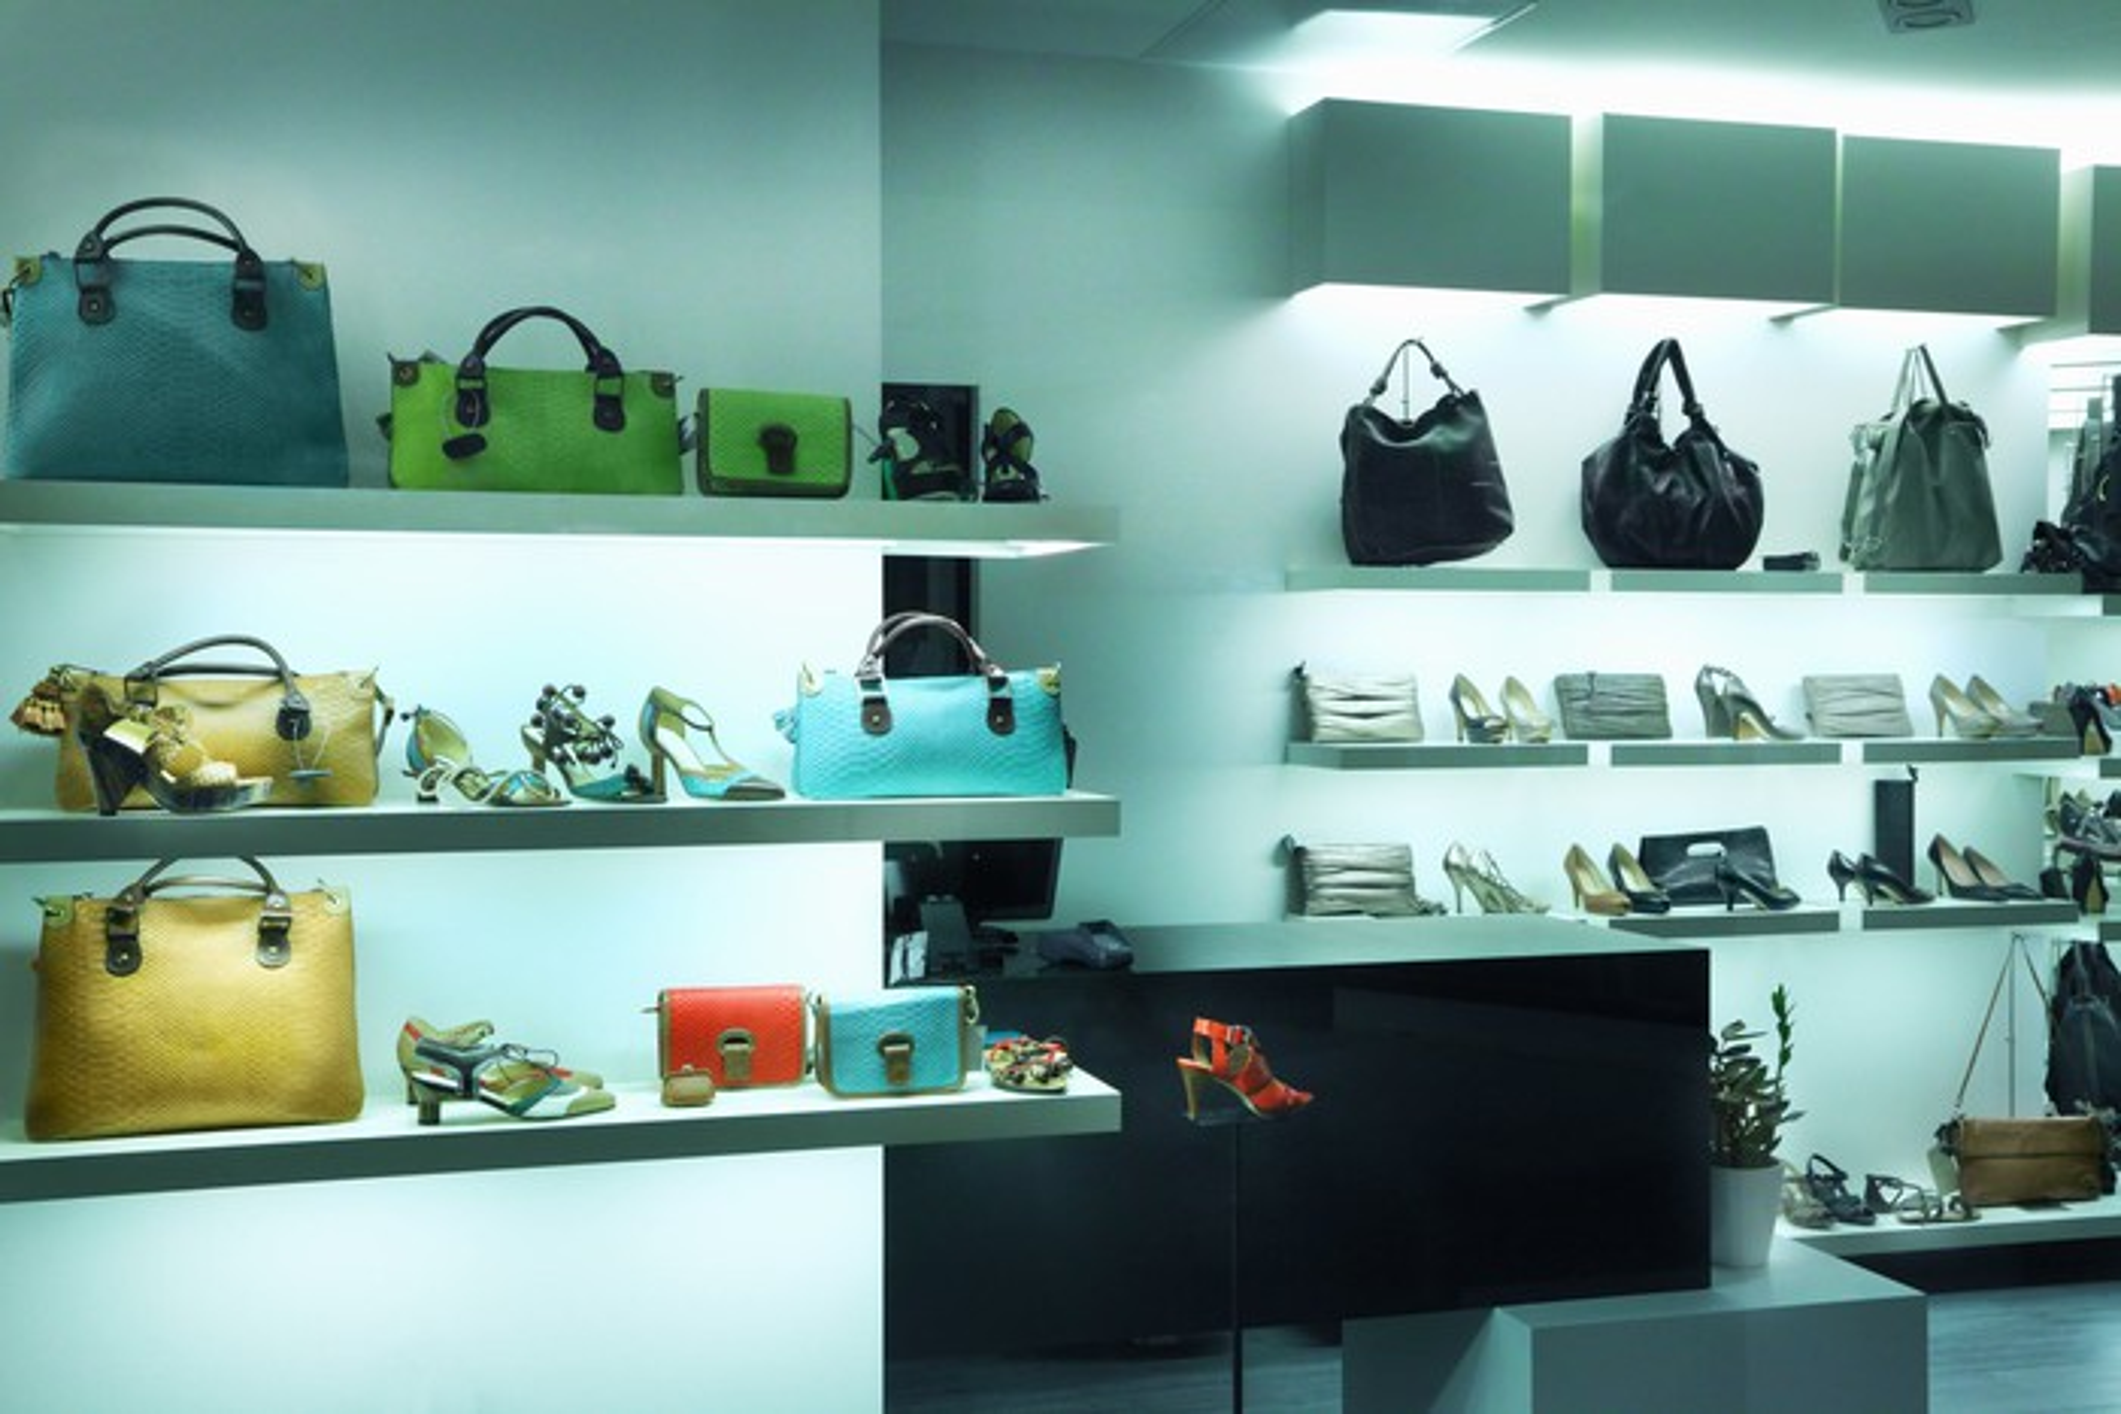 Luxury purses for sale